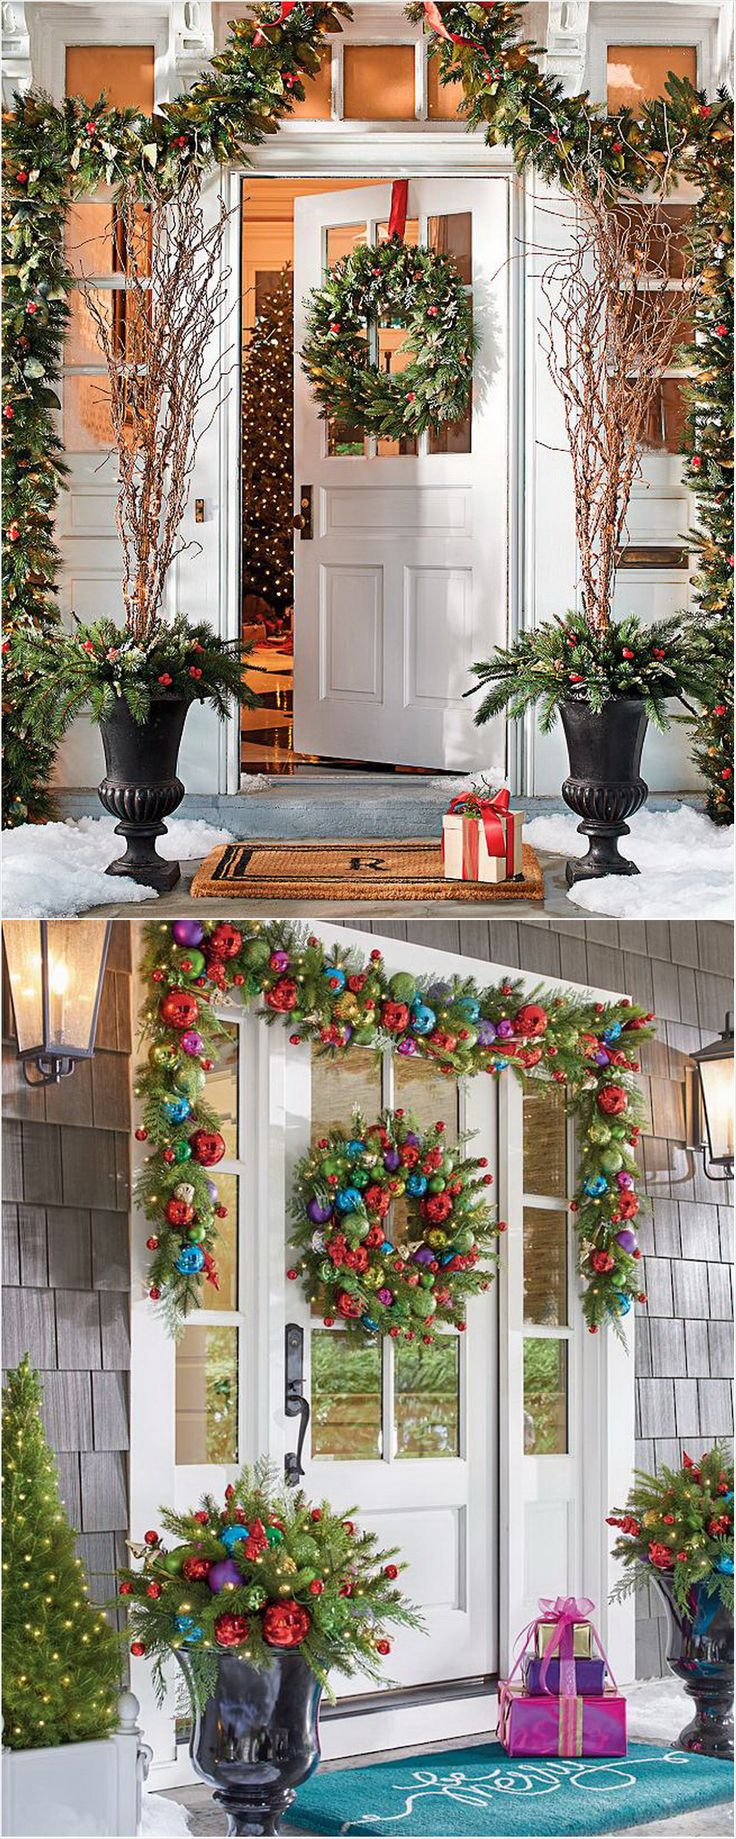 16 Stylish IndoorOutdoor Christmas Decorations grandinroad 1711